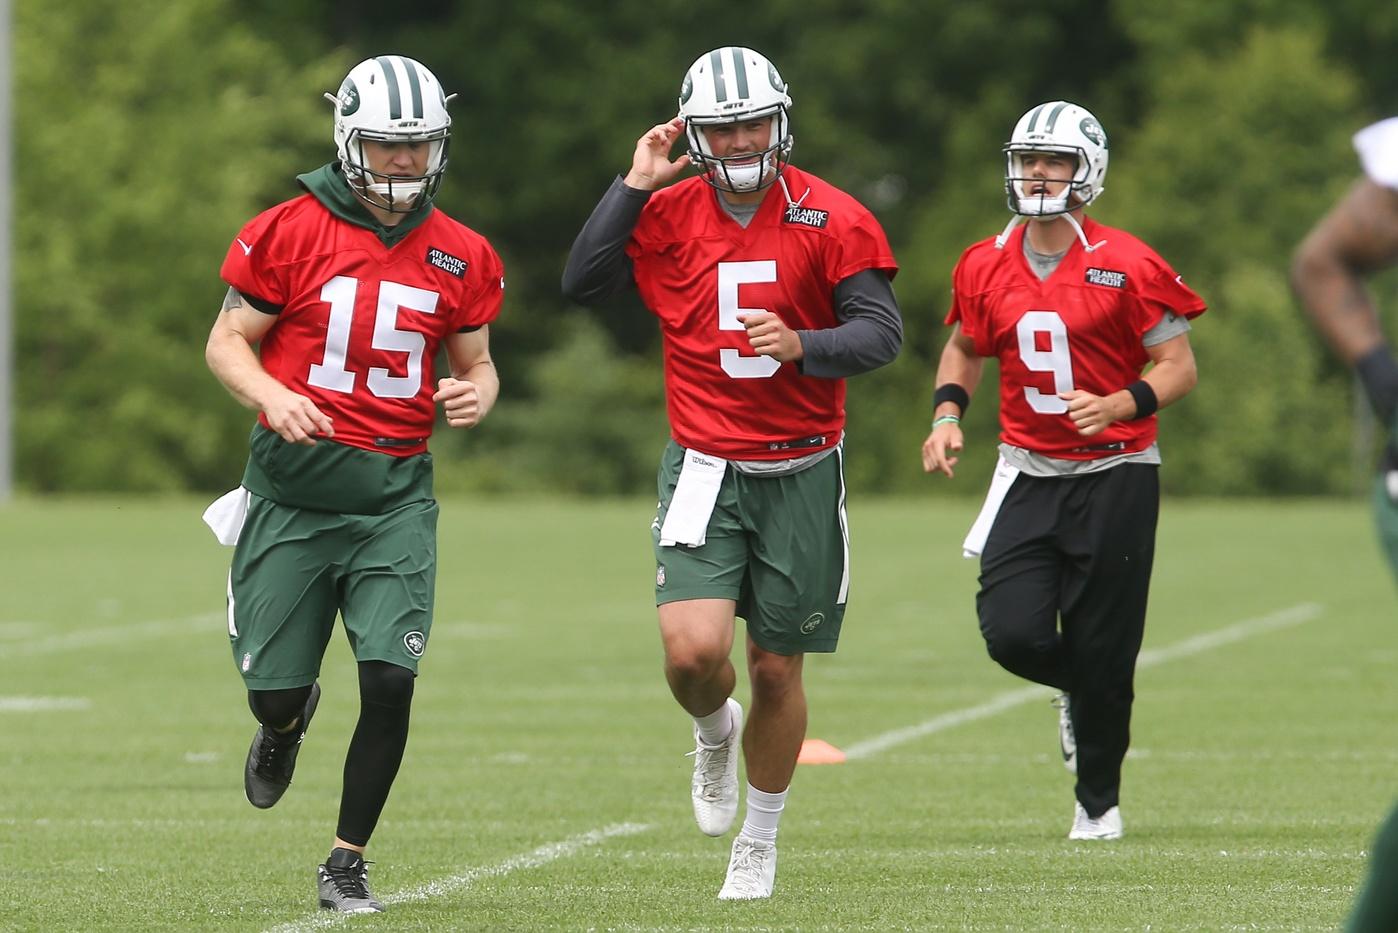 Jets quarterbacks Josh McCown Bryce Petty Christian Hackenberg New York Jets NFL training camp